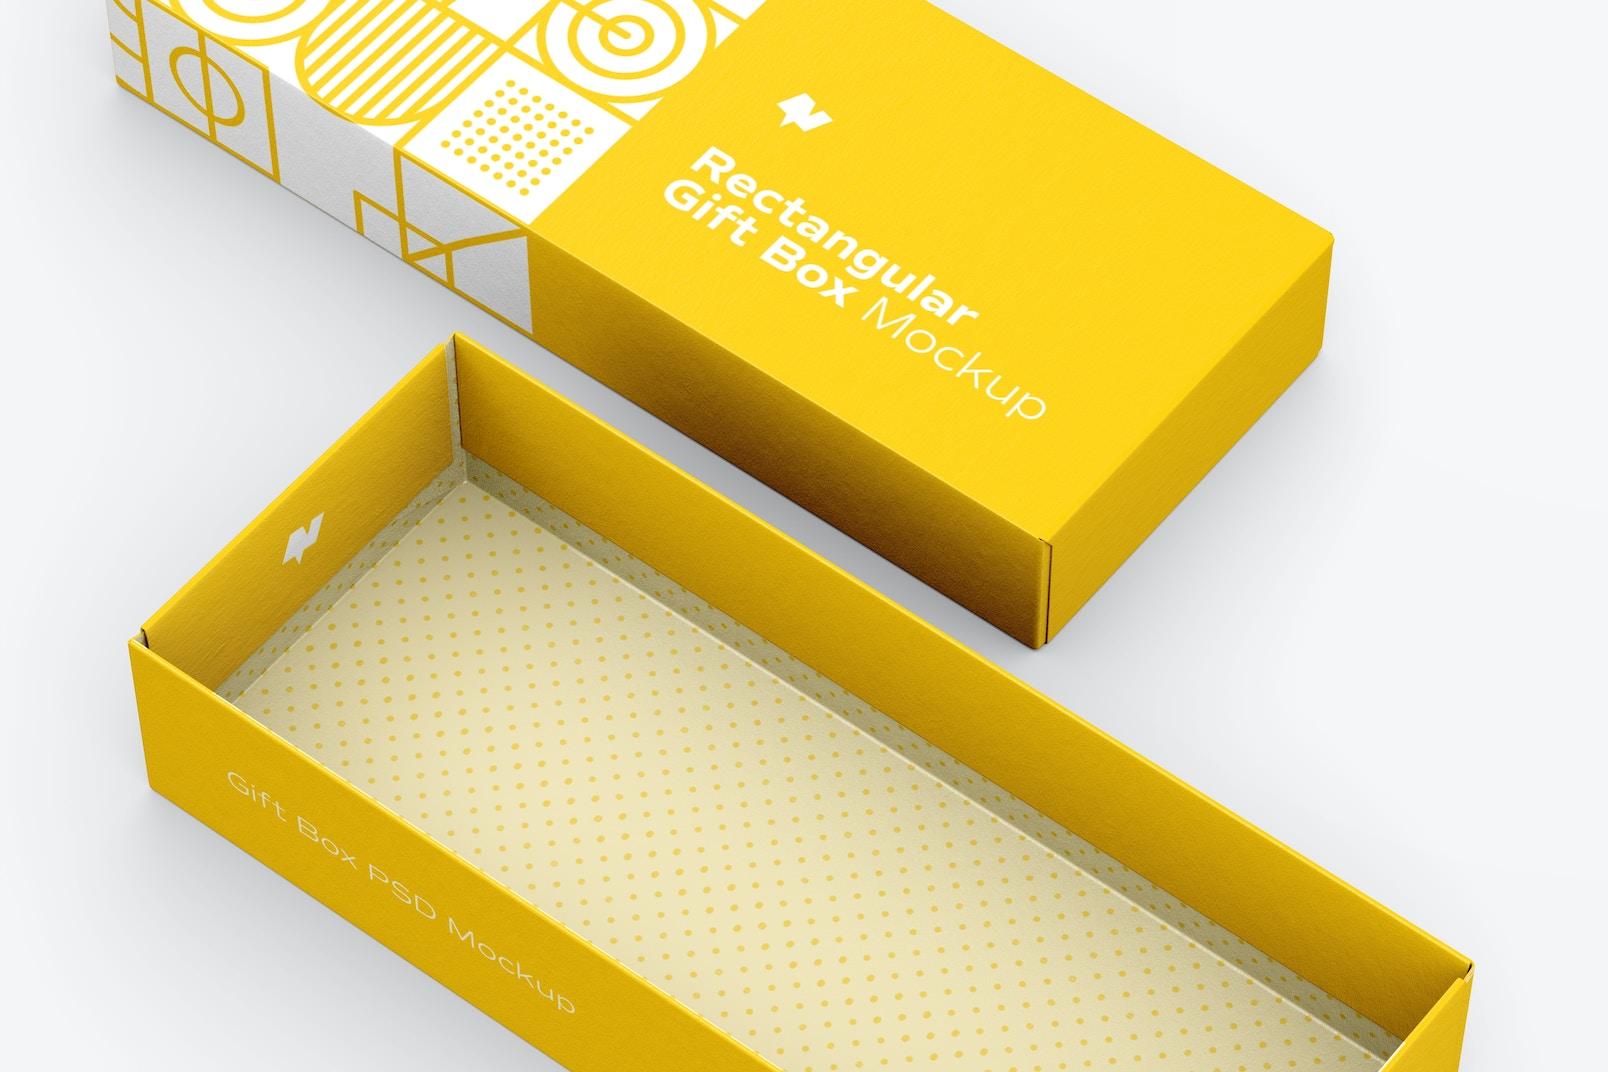 Rectangular Gift Box Mockup, Close Up